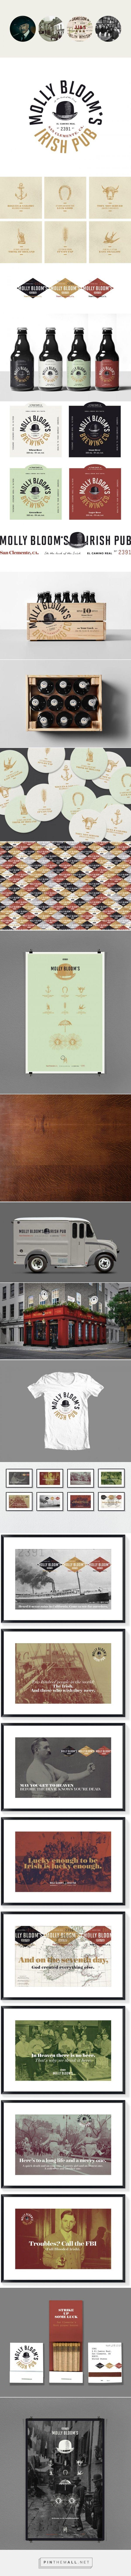 Molly Bloom's iris pub branding - Grits + Grids - created via https://pinthemall.net